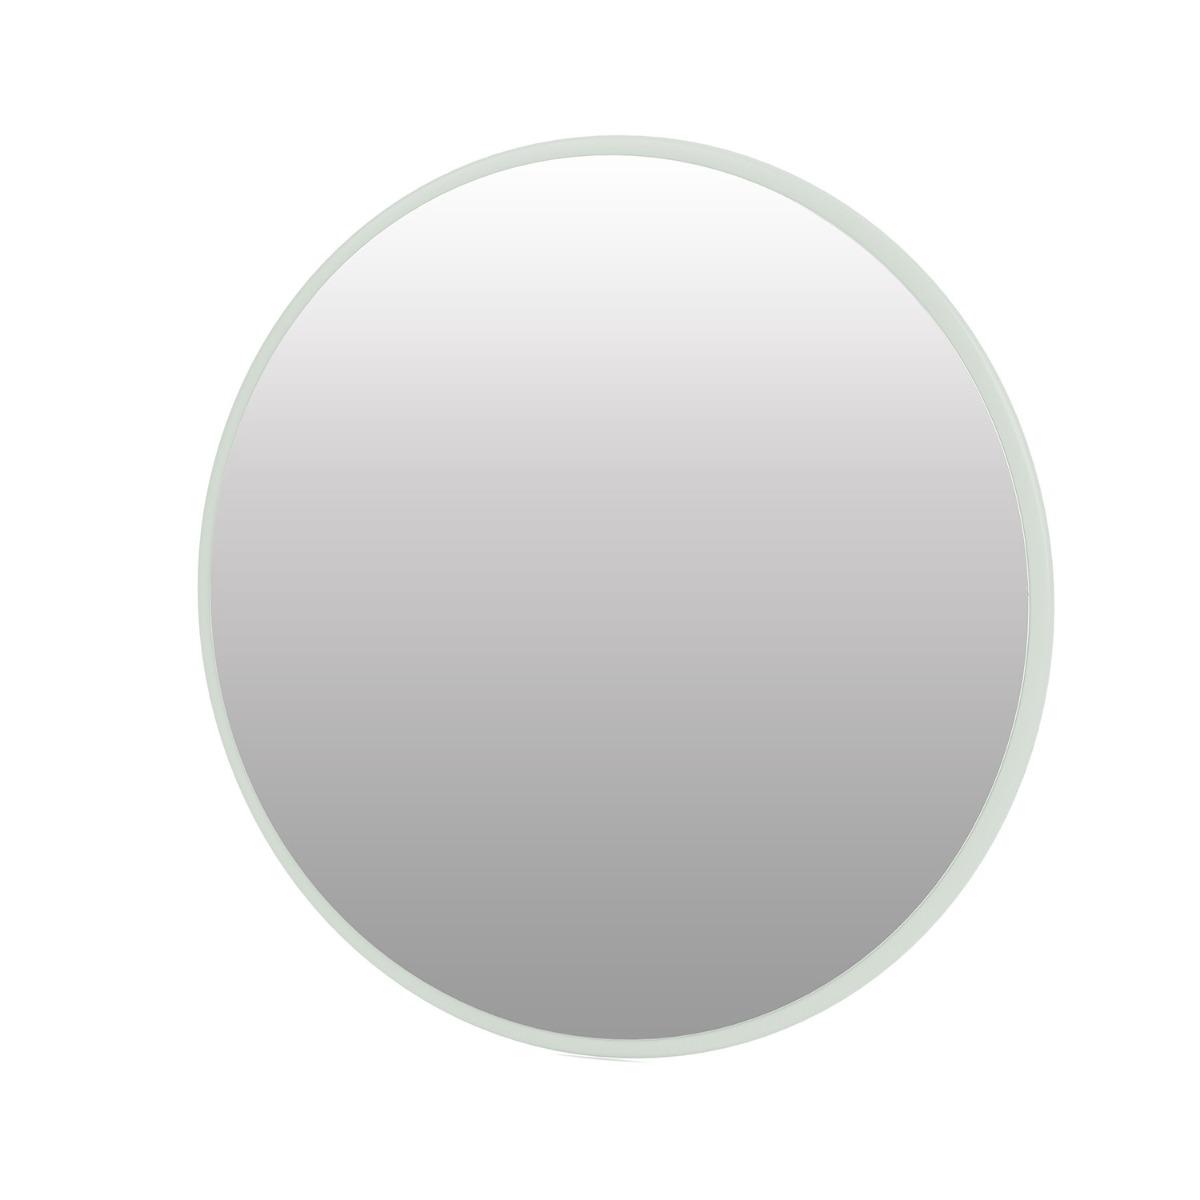 Montana Mini Spegel Rund 35 cm Mist